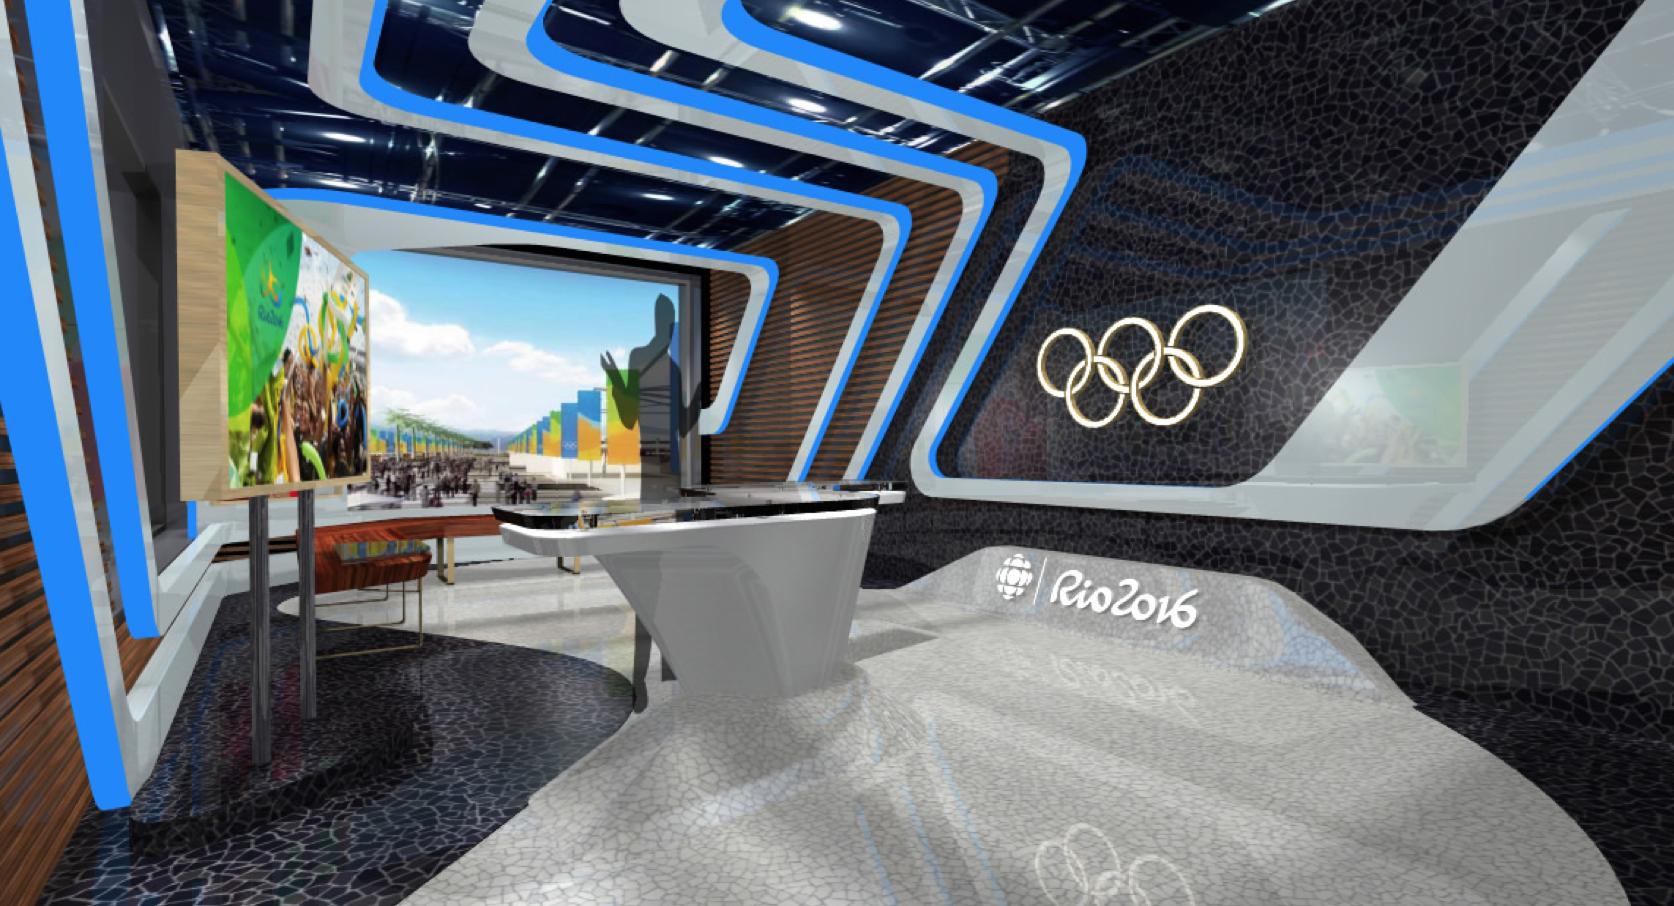 ncs_CBC-Rio-Olympics-TV-Studio_0013